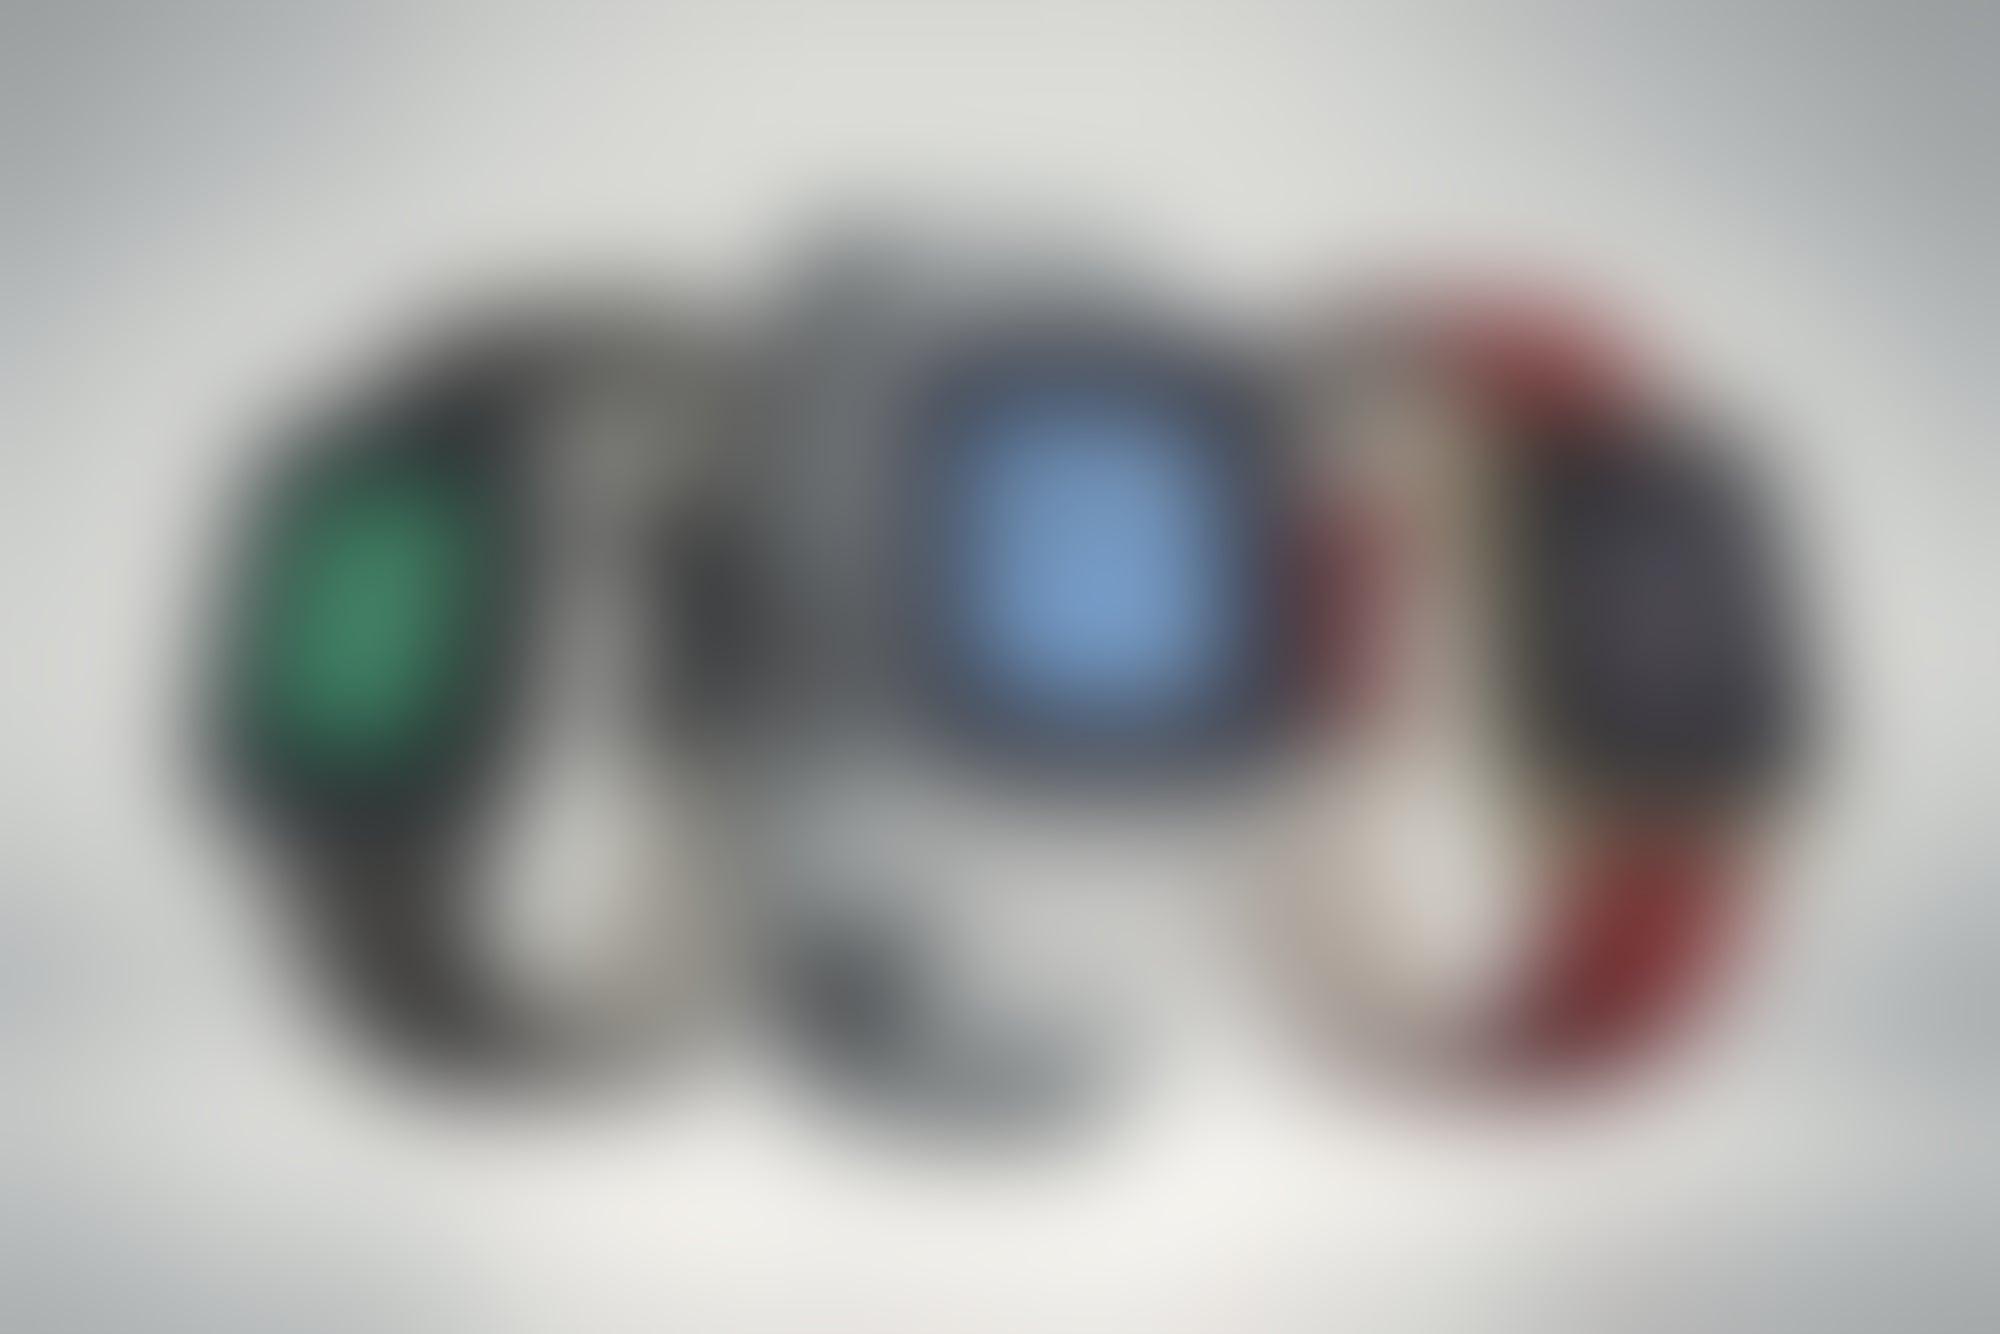 Pebble Time Hits $20 Million on Kickstarter